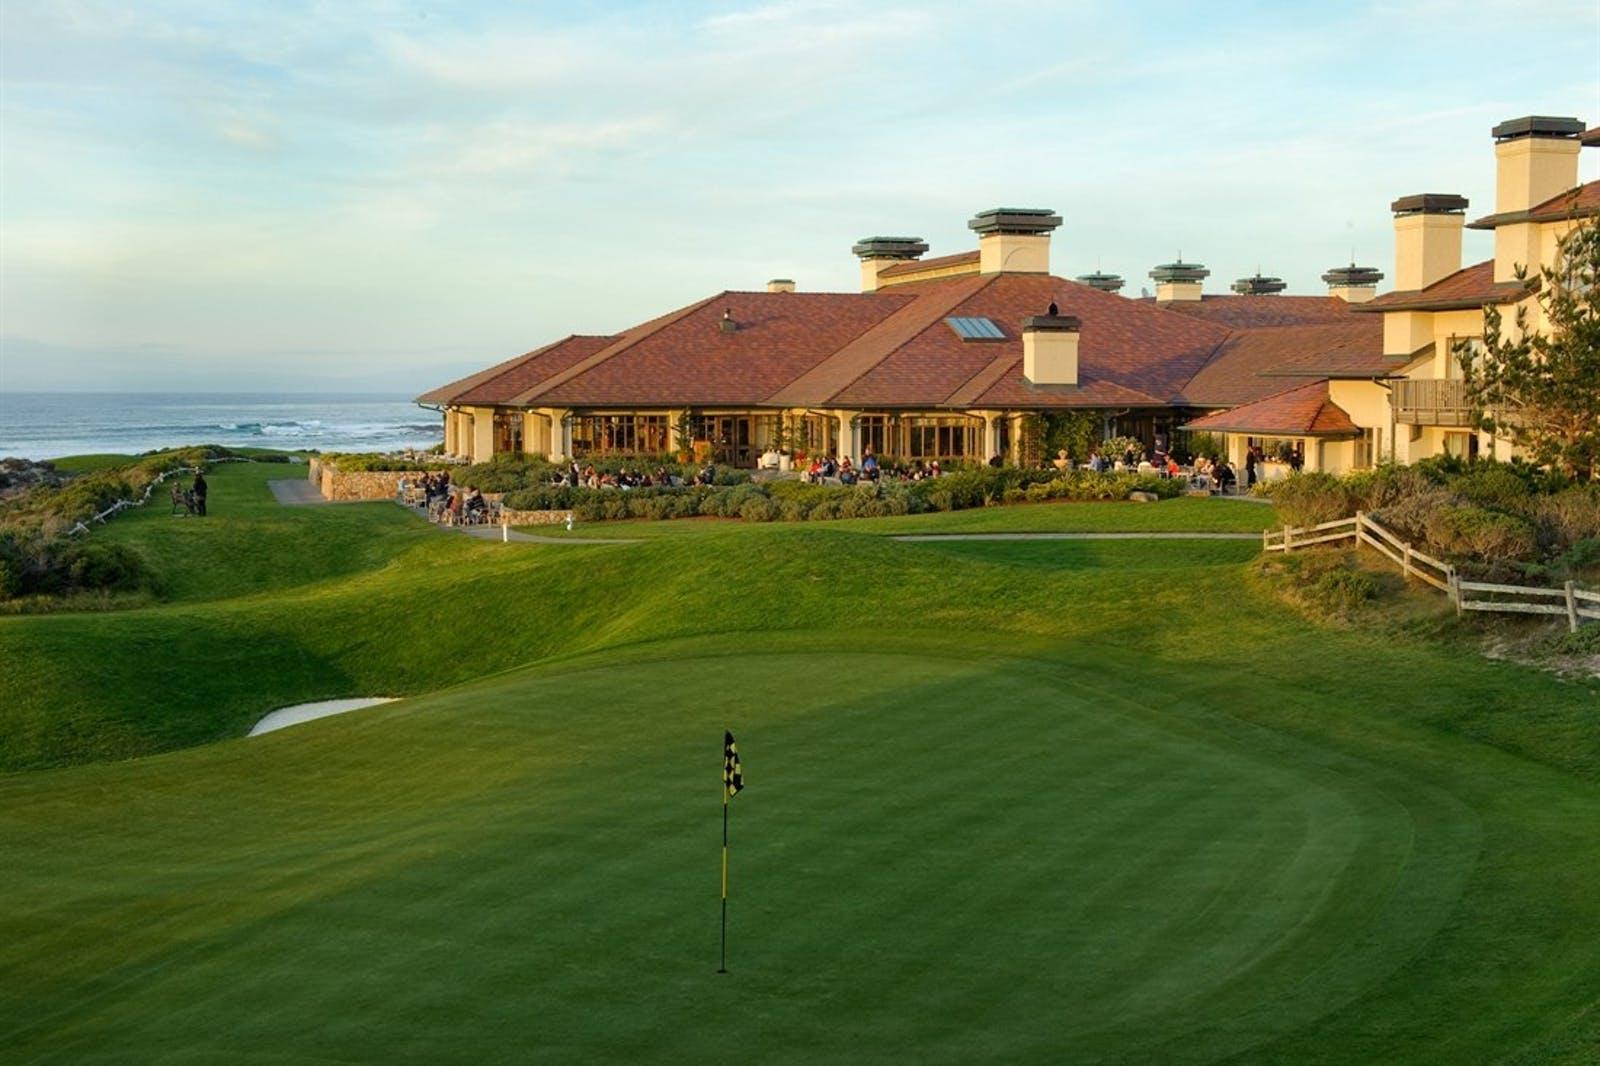 The Inn at Spanish Bay | Luxury California Hotel | ITC